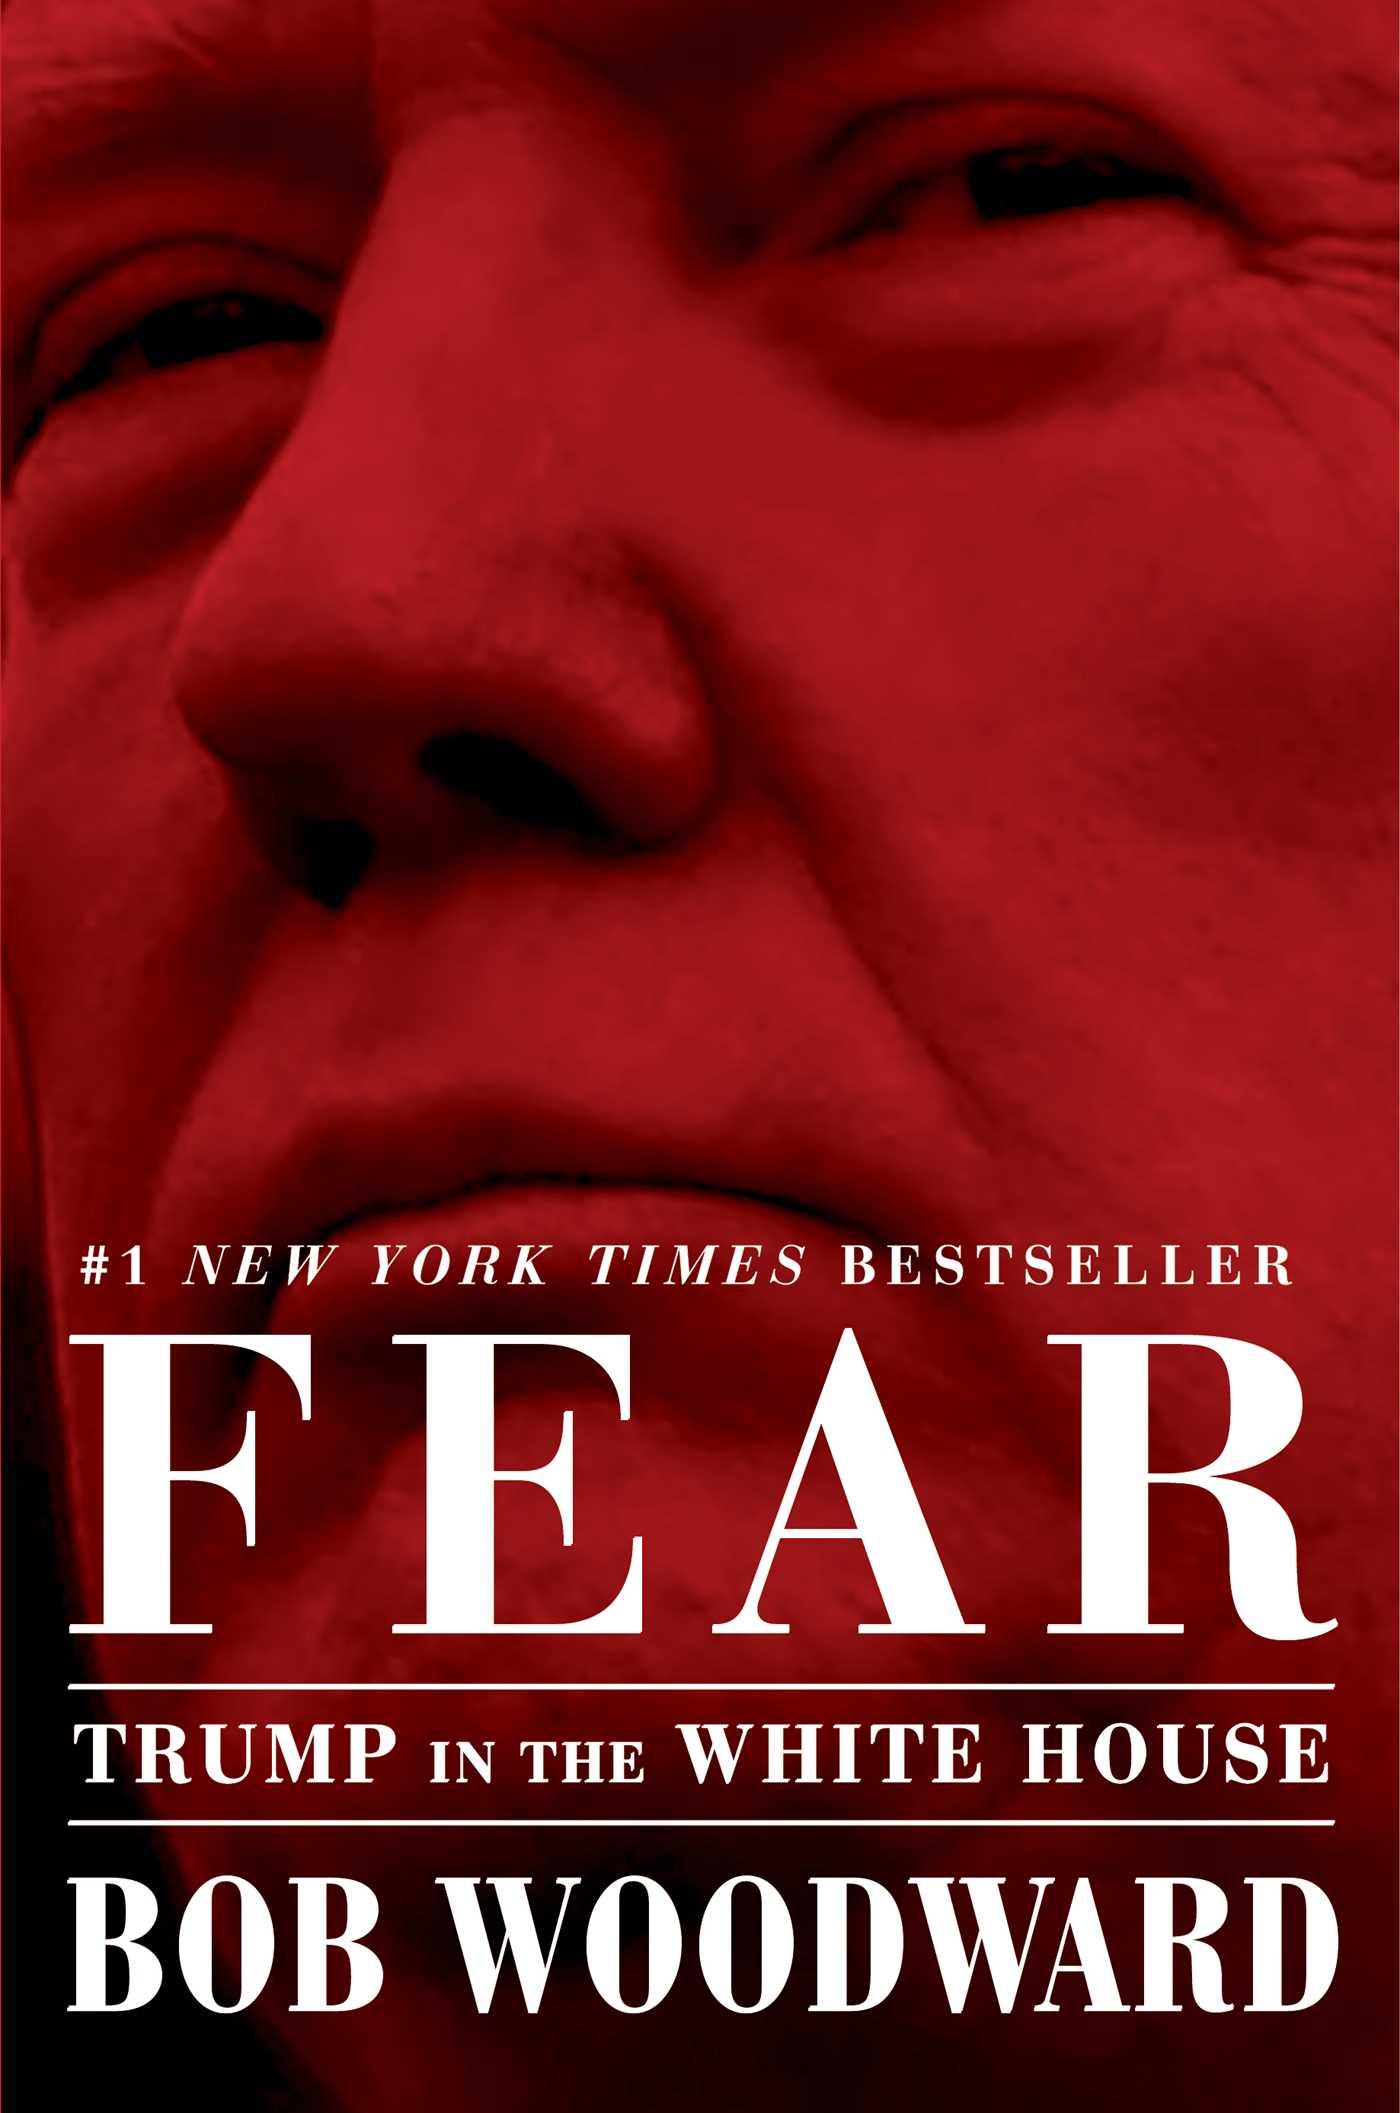 2019-03-28-image-fear.jpg